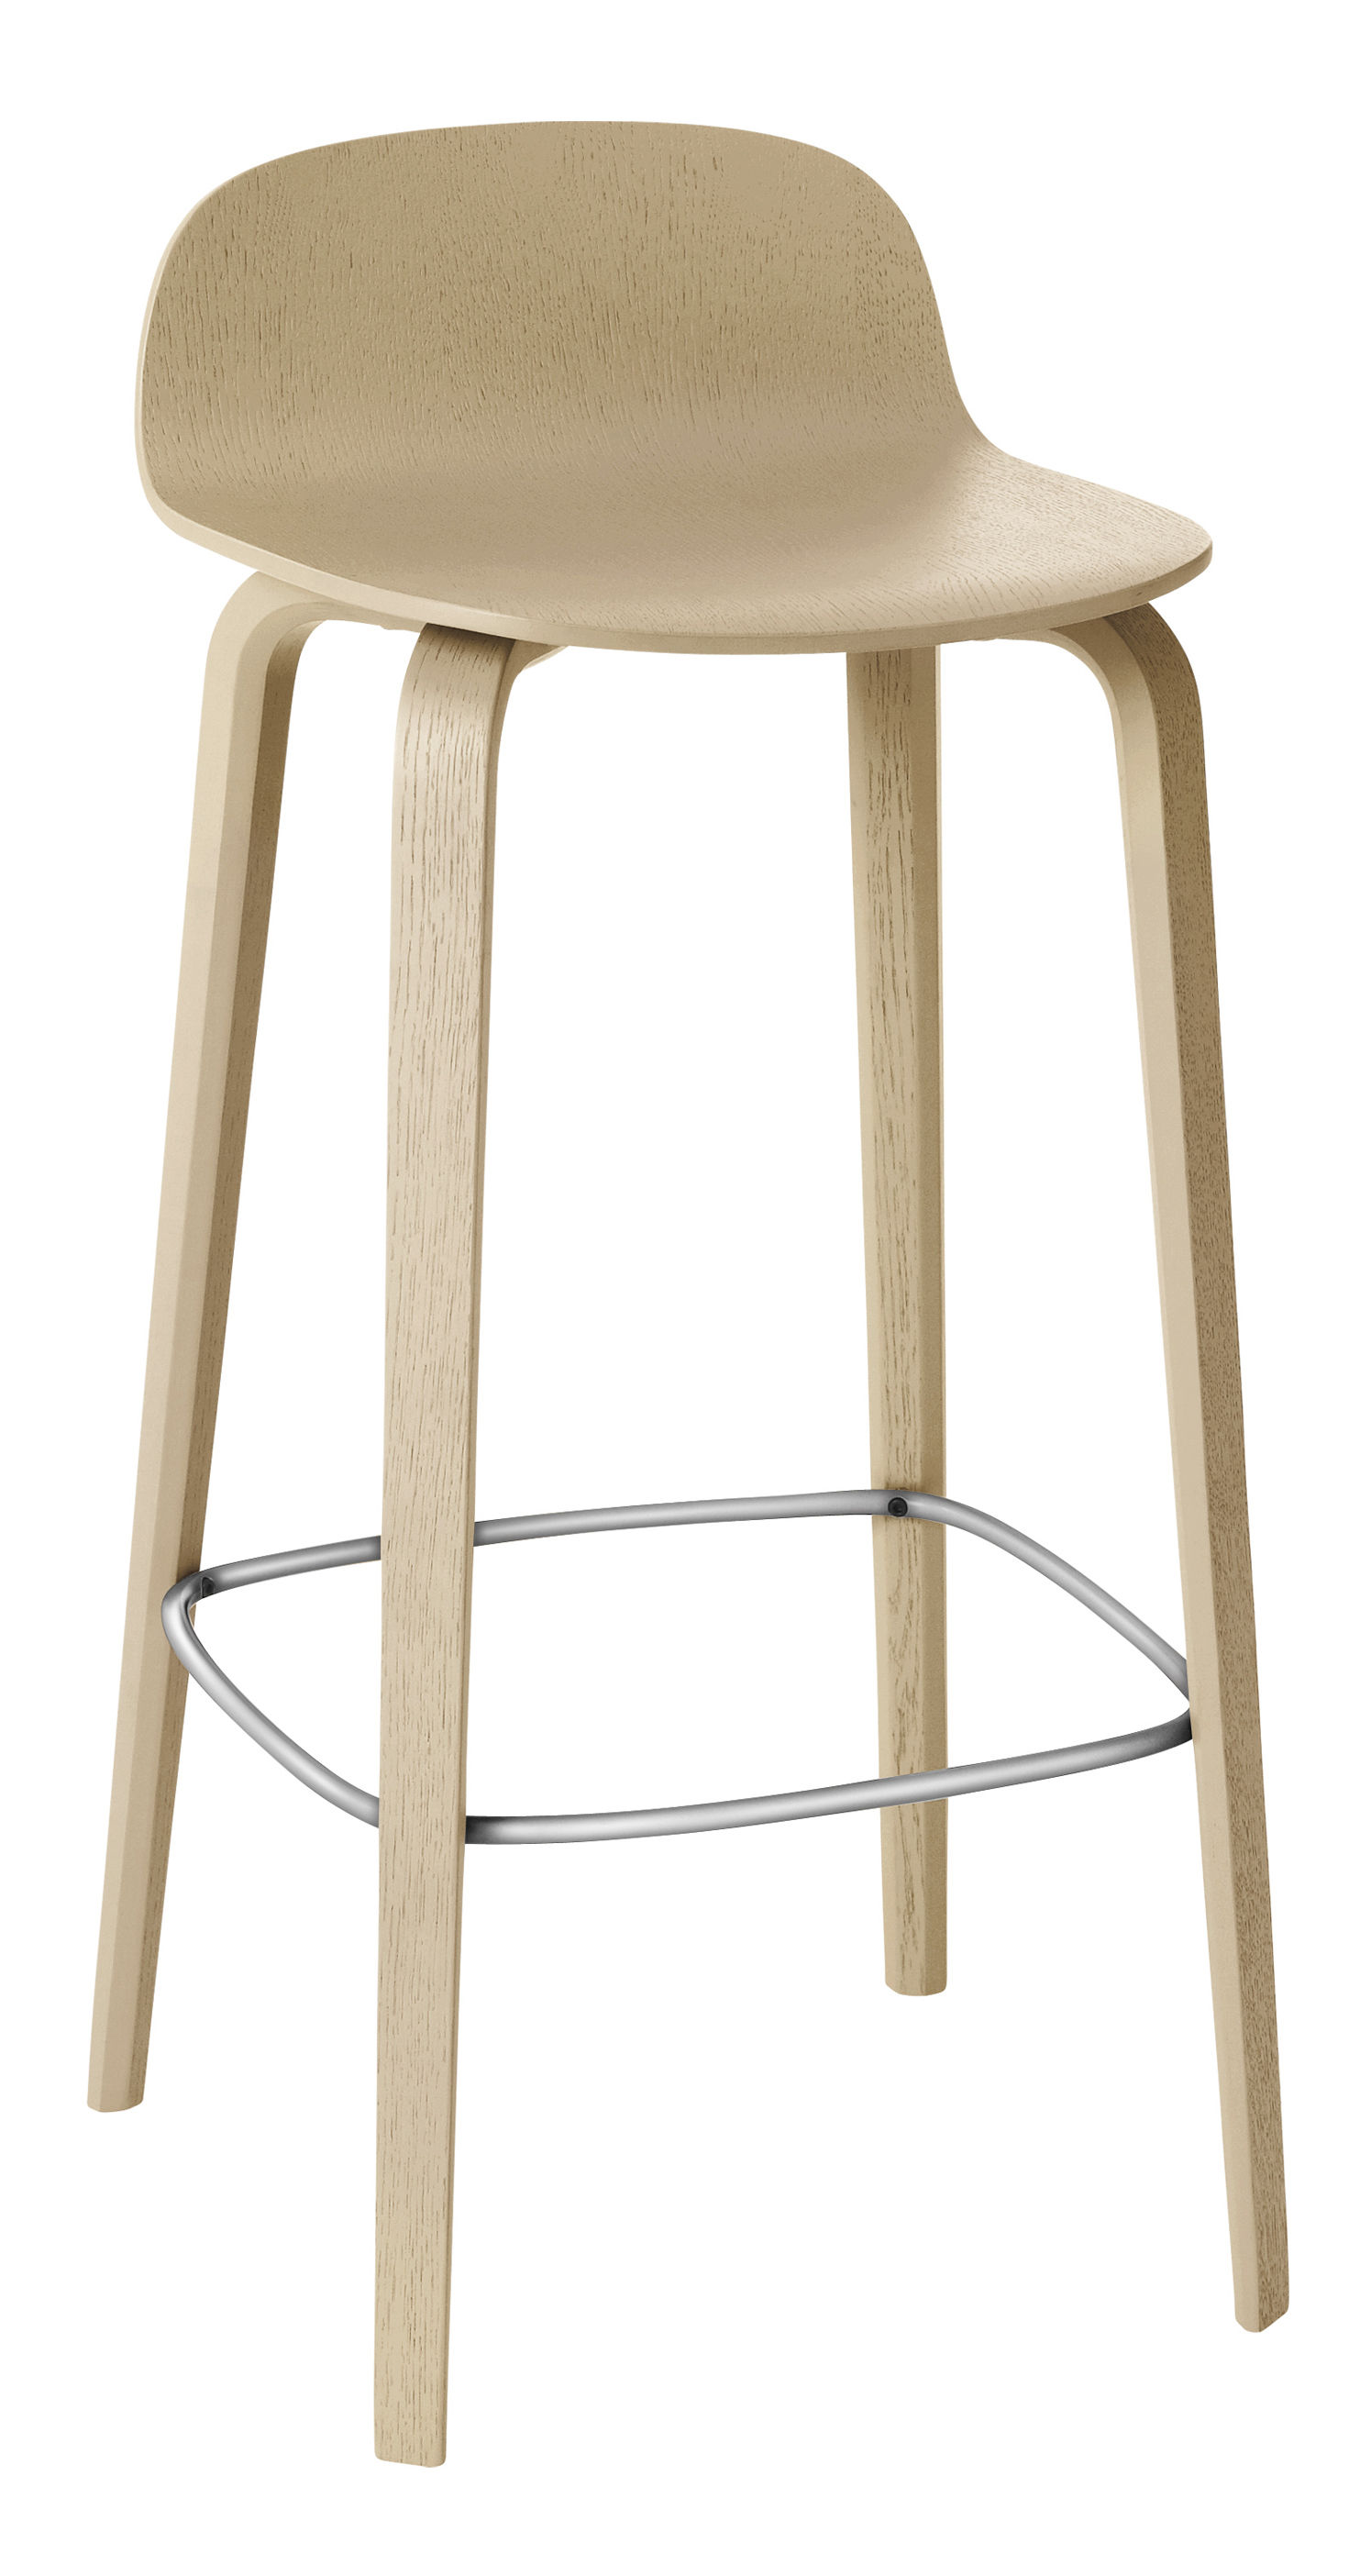 Furniture - Bar Stools - Visu Bar stool - Wood - H 65cm by Muuto - Oak - Oak veneer, Varnished steel